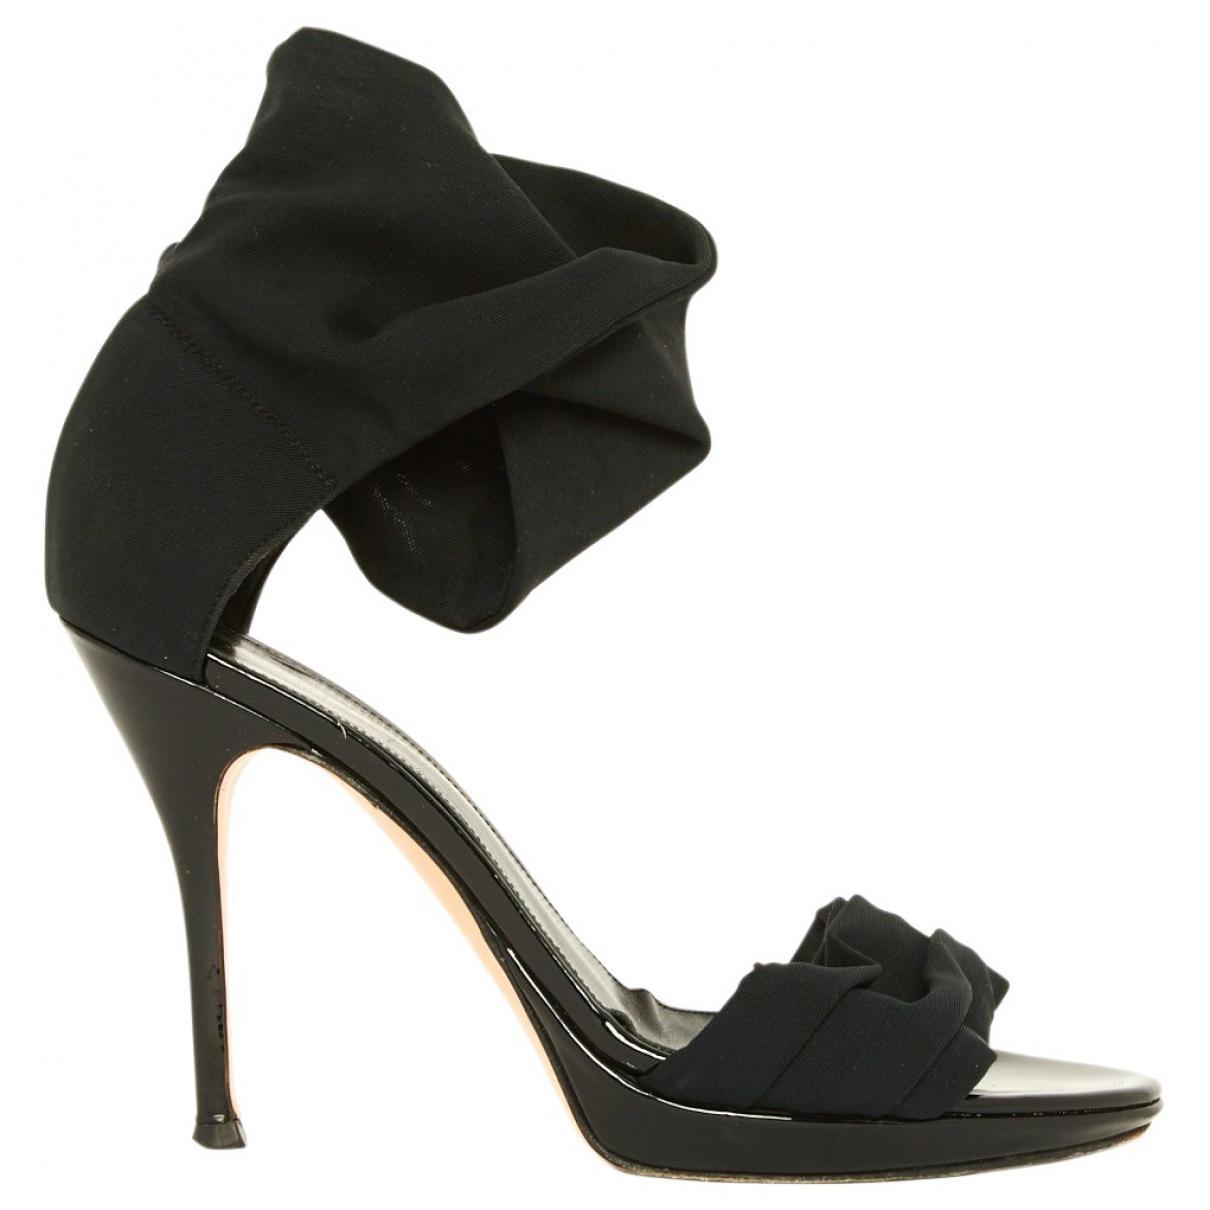 Pre-owned - Leather sandal Gianvito Rossi bGNTye1Ue6